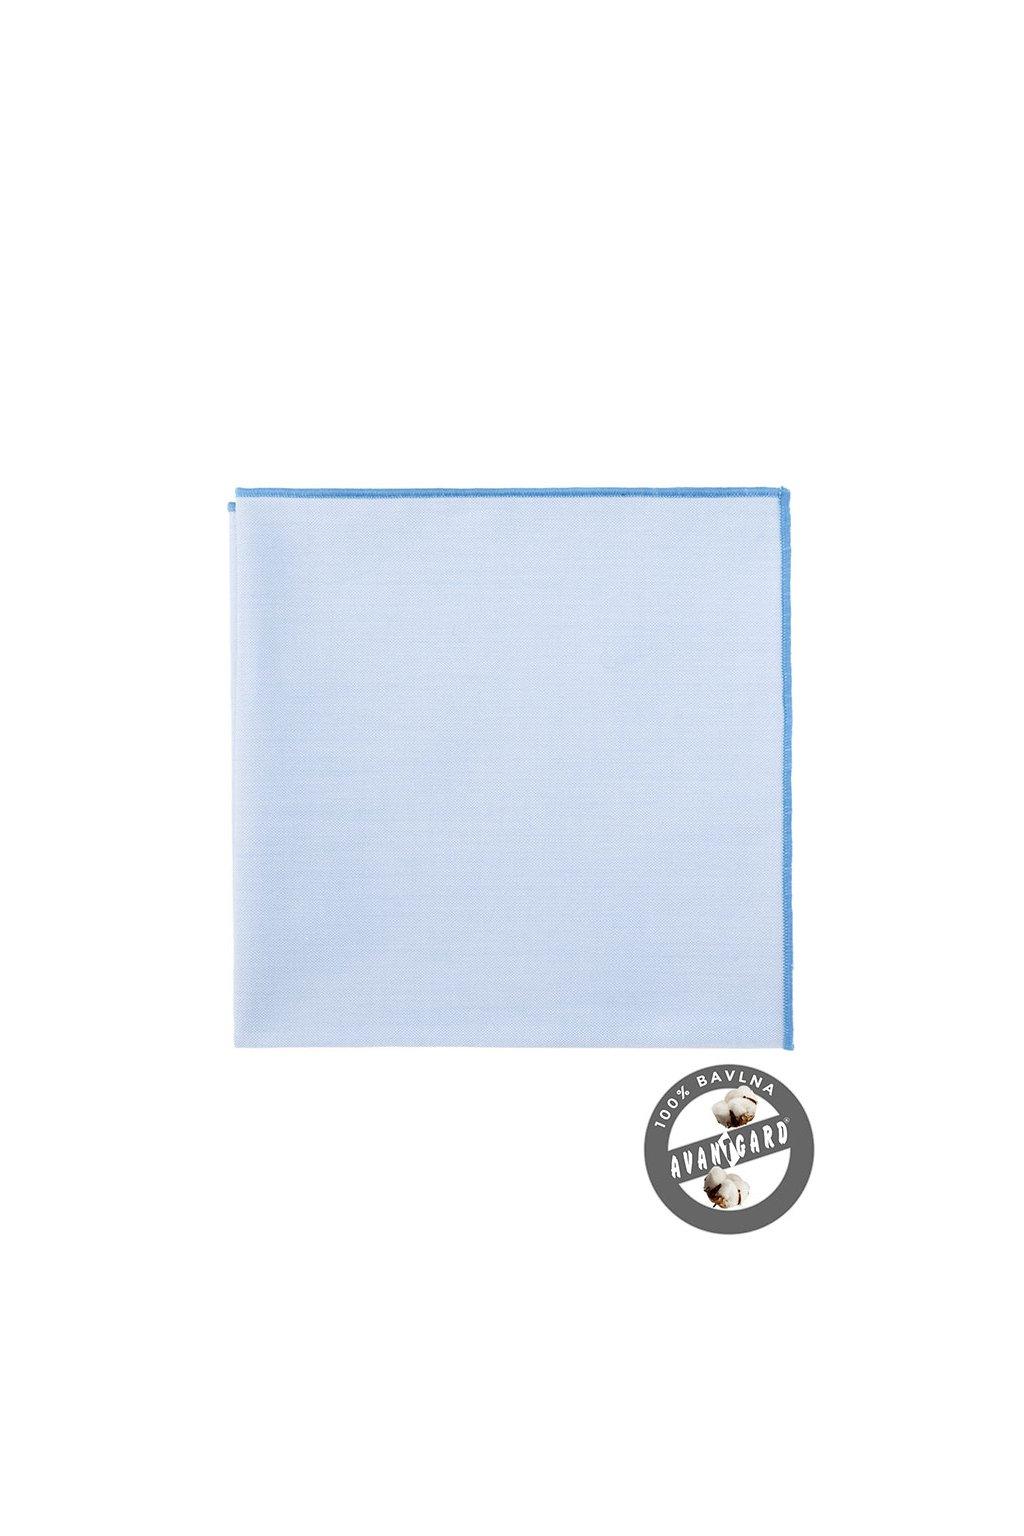 Kapesníček AVANTGARD LUX modrá 583 - 5177